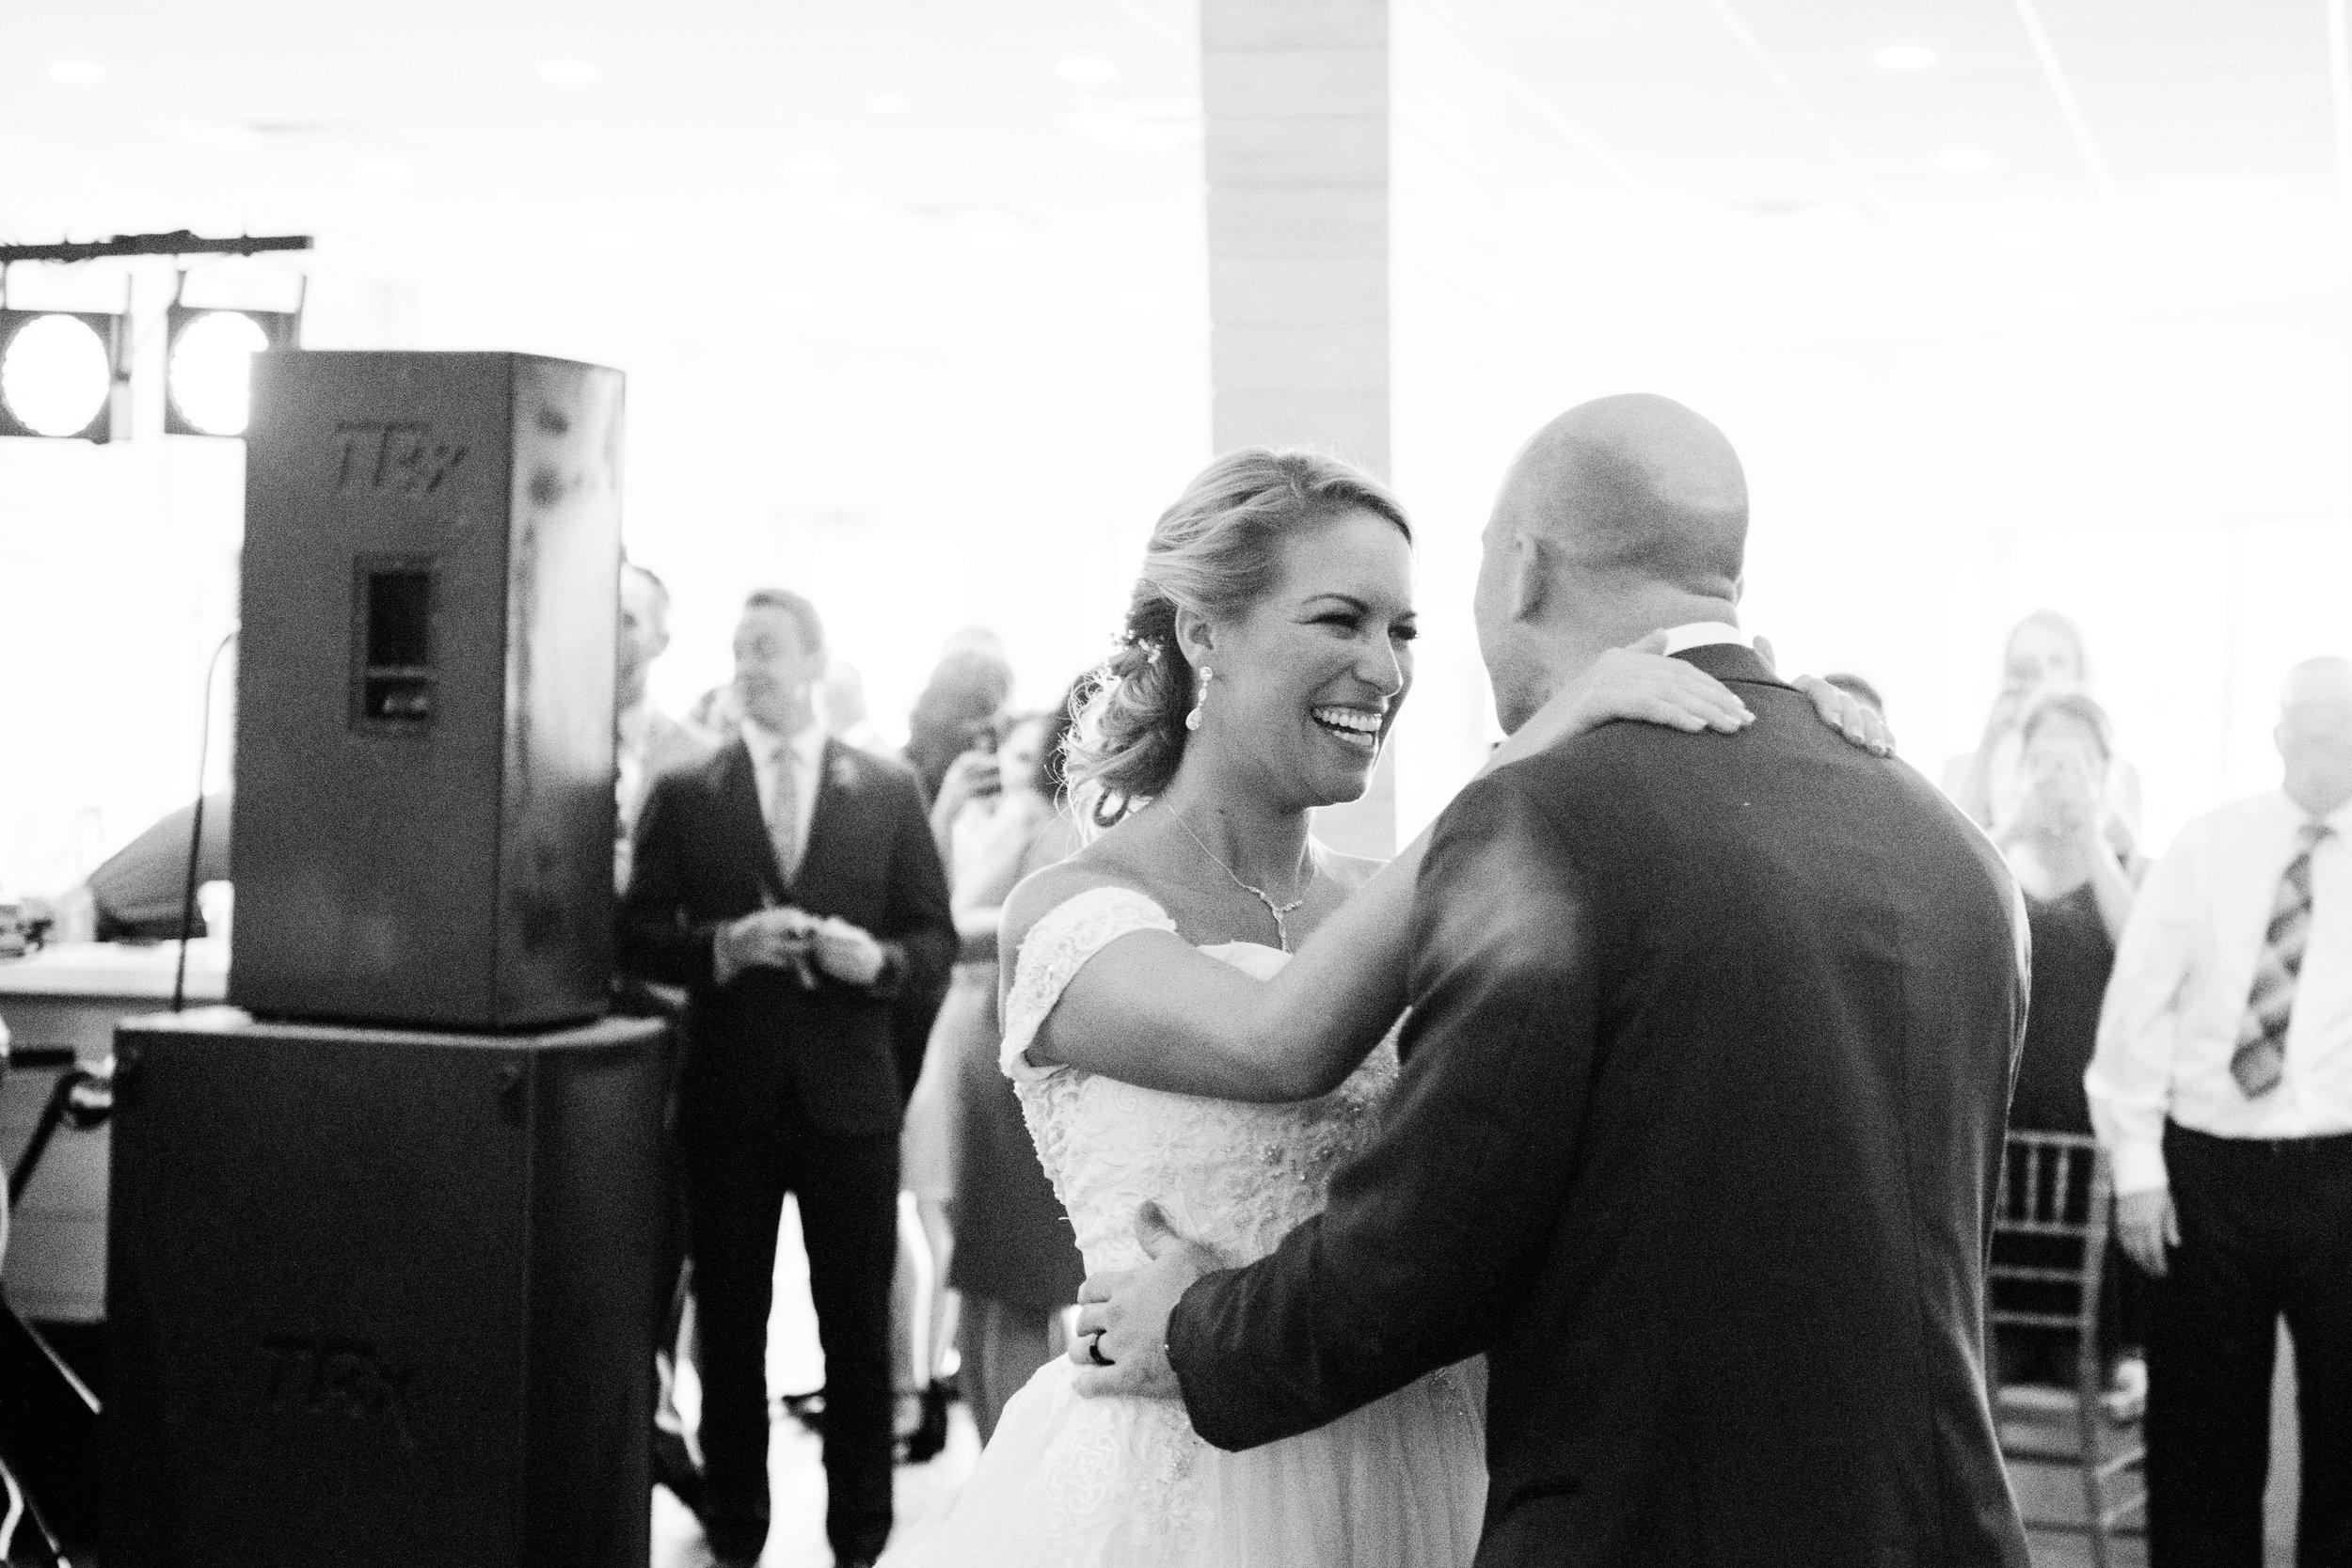 ICONA GOLDEN INN AVALON NJ WEDDING PHOTOGRAPHY  - 071.jpg